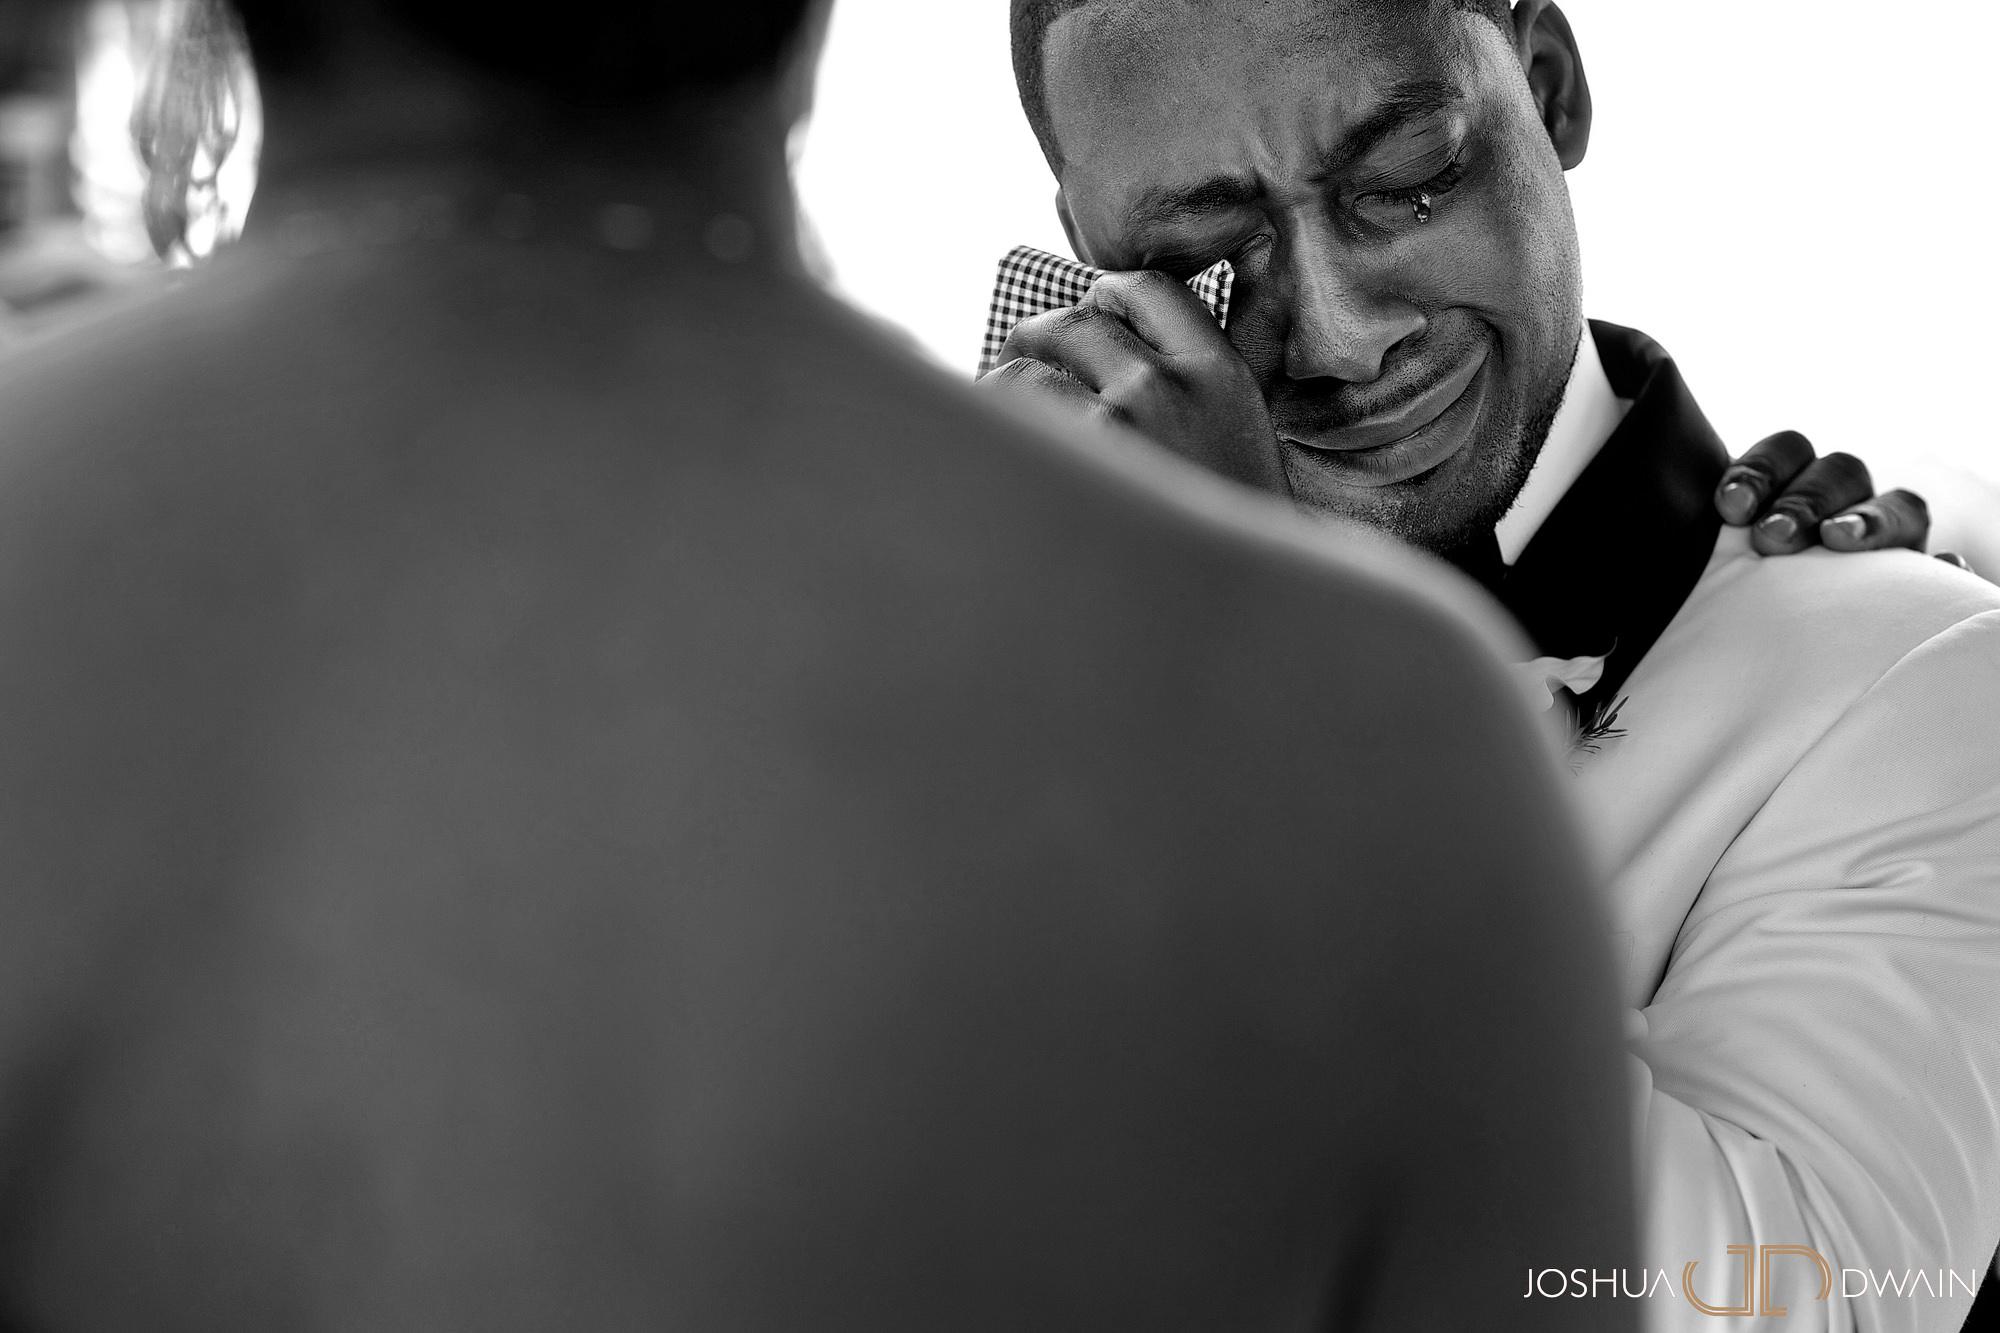 joshua-dwain-weddings-gallery-best-wedding-photographers-us-047